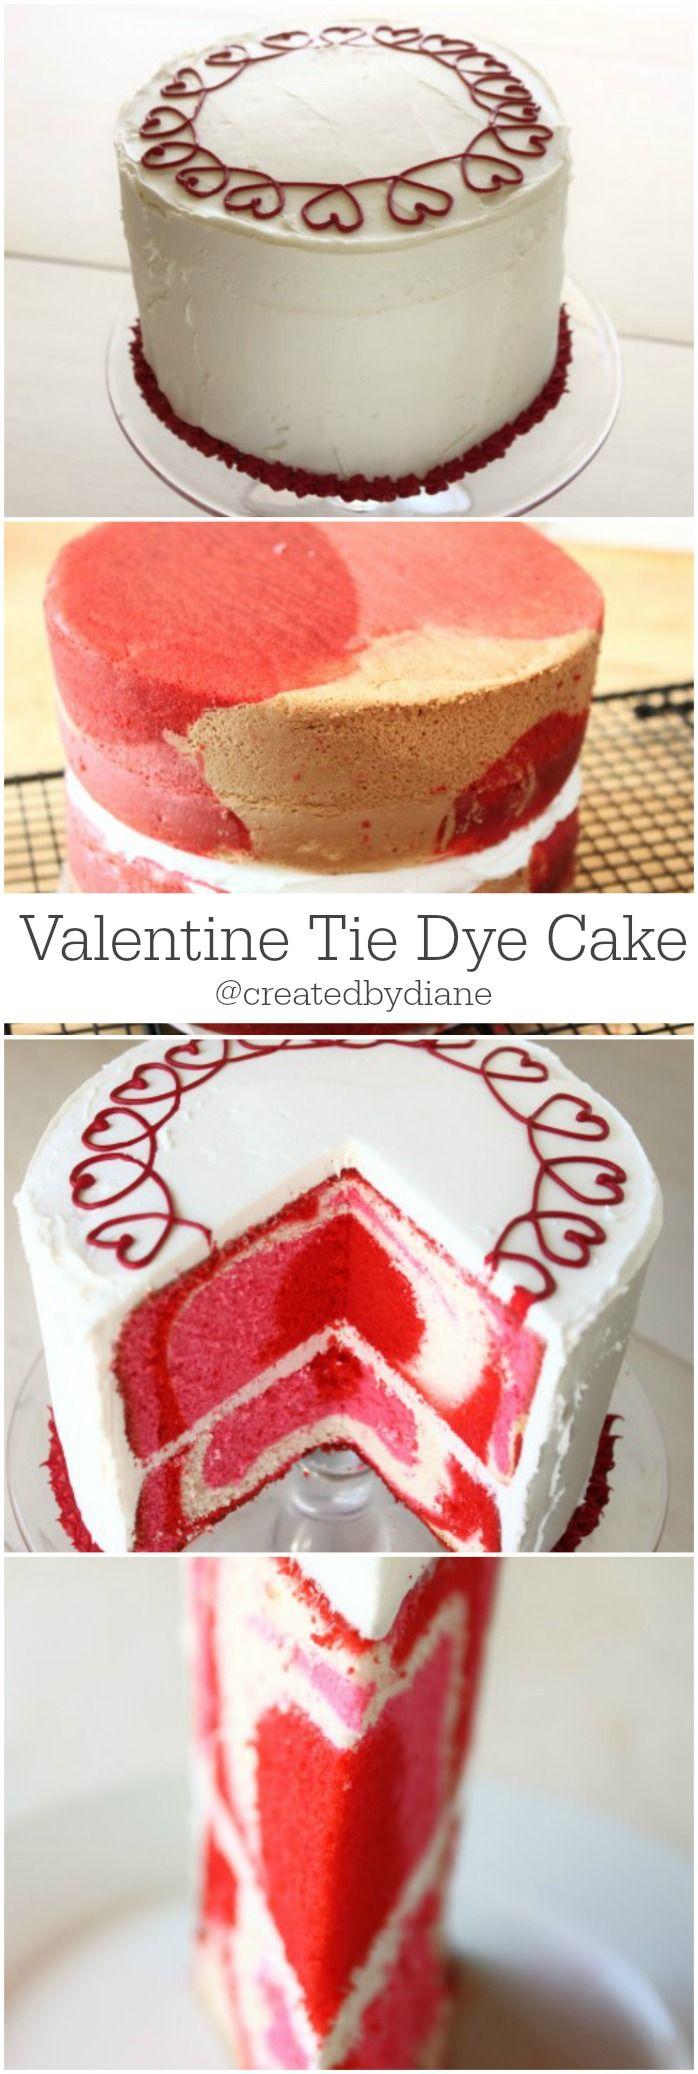 Valentine Cake @createdbydiane